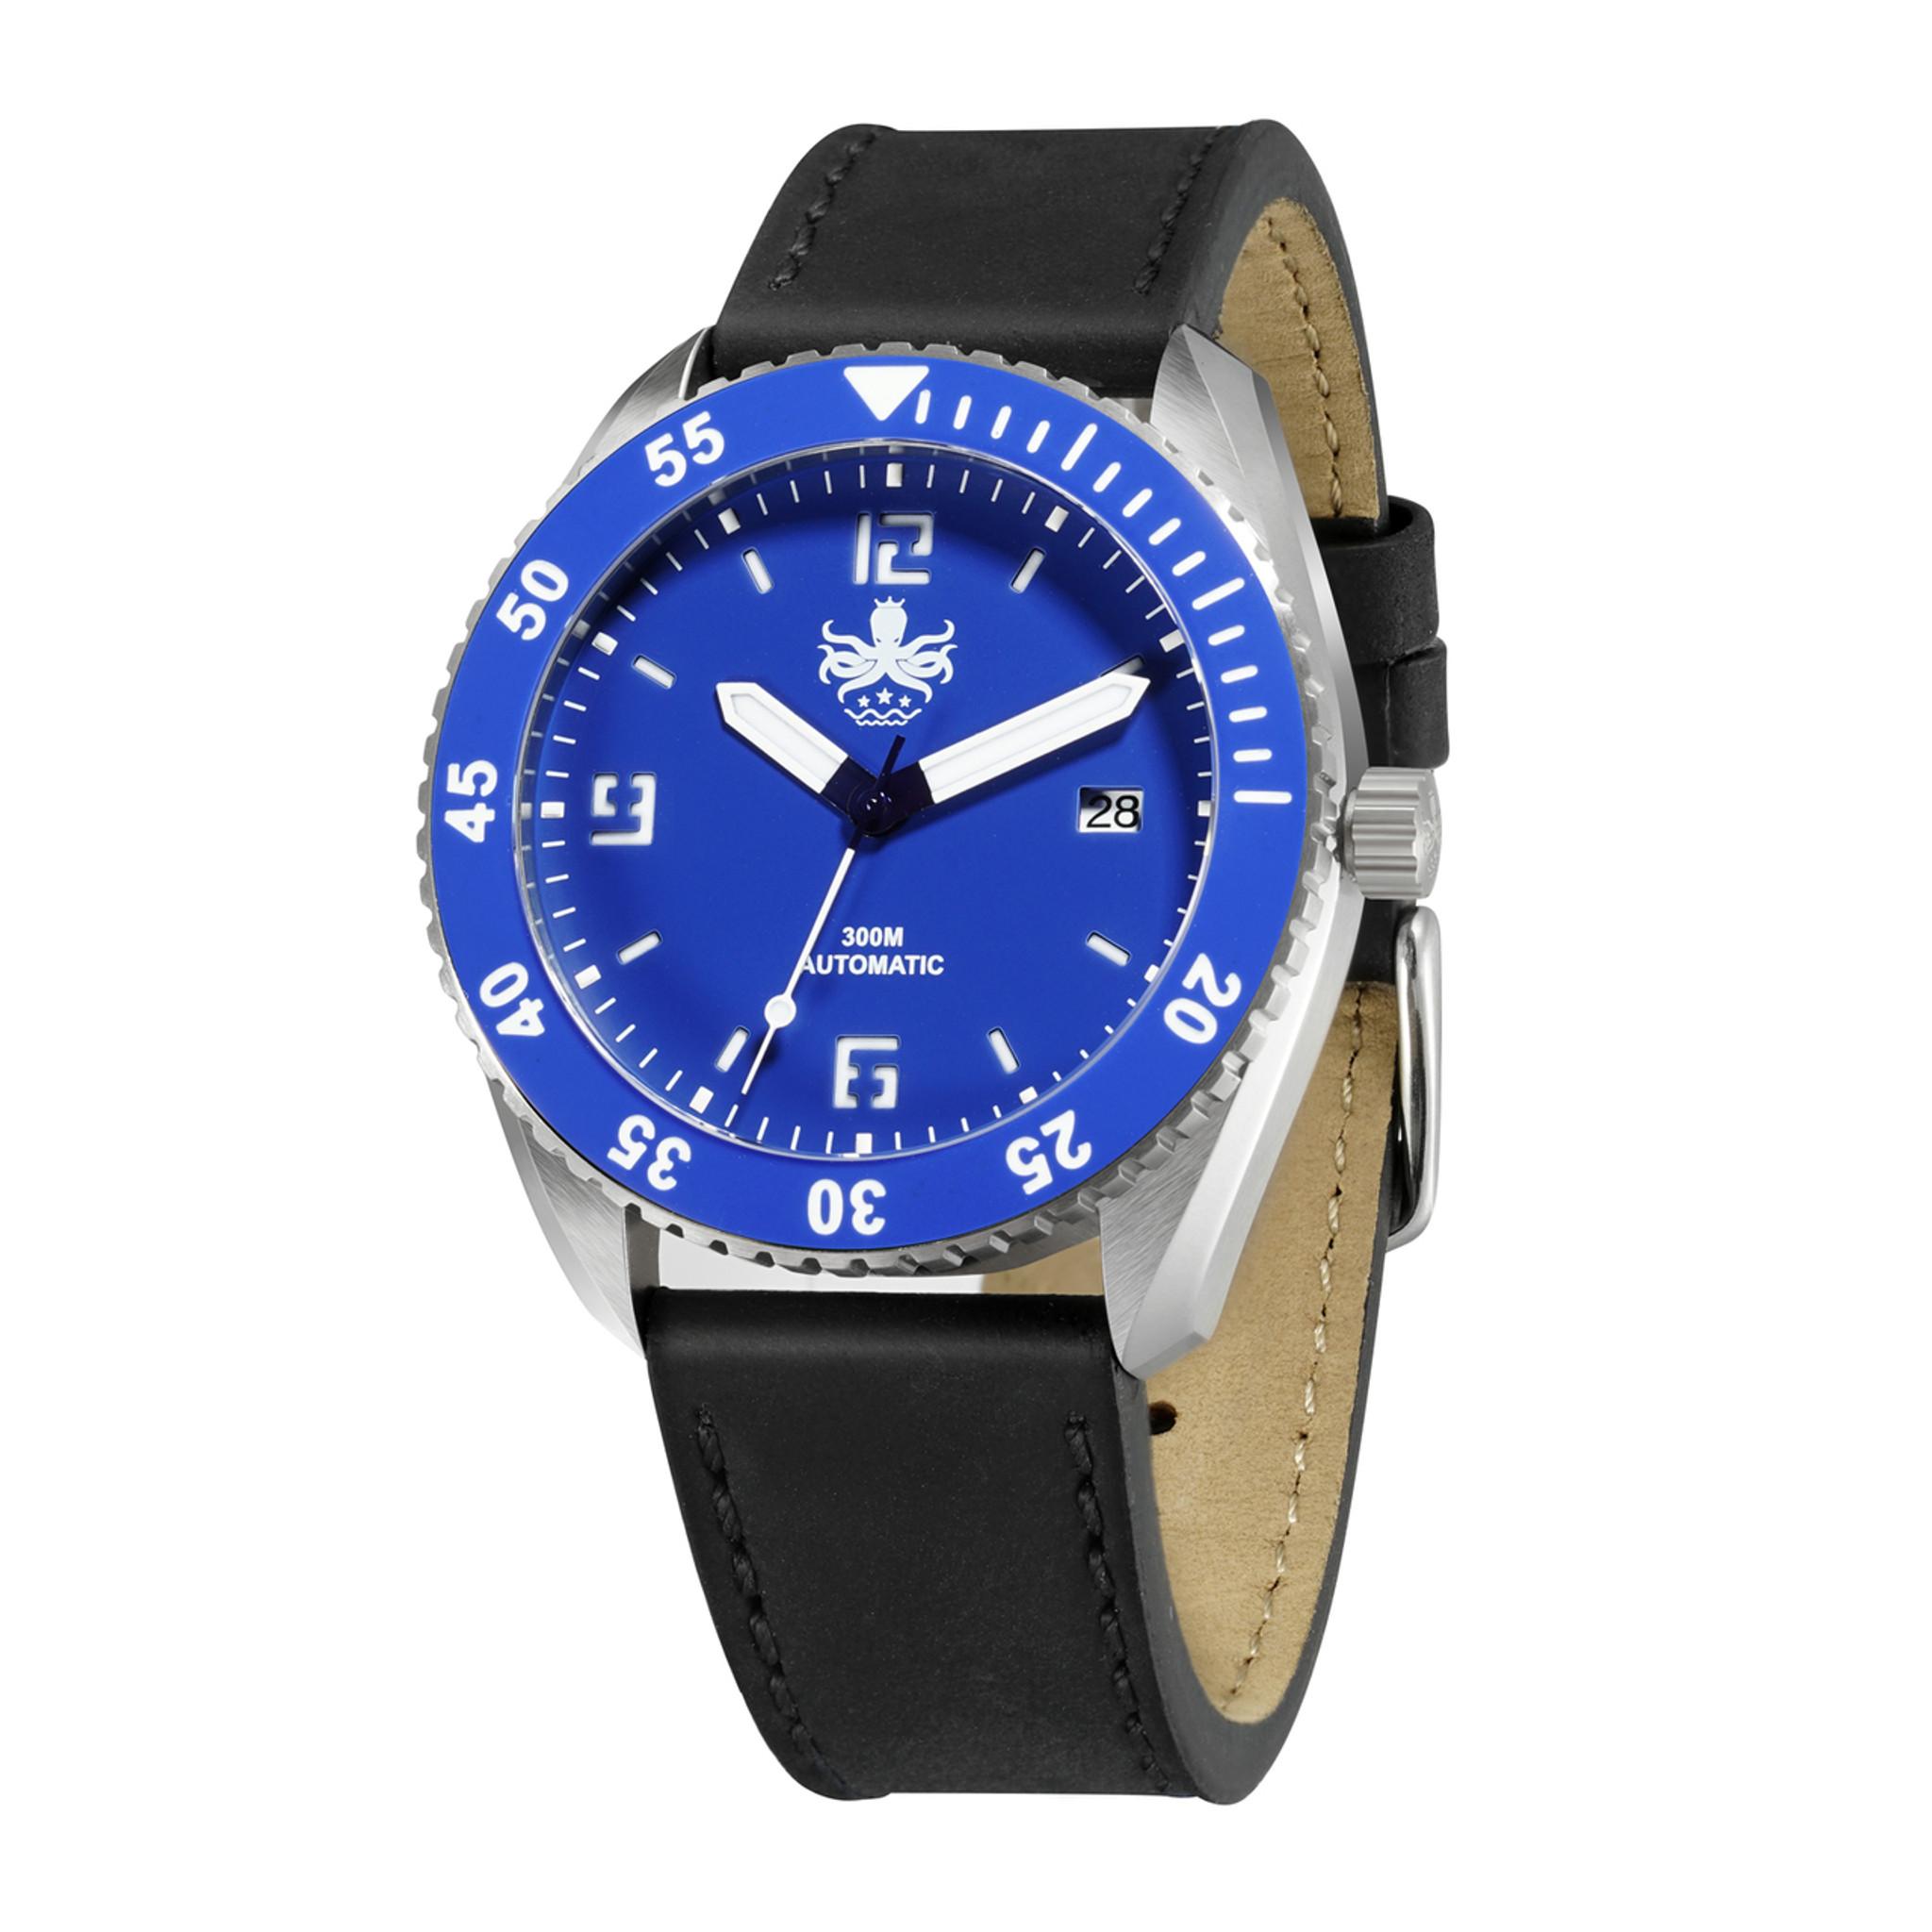 38e3a1708b8 PHOIBOS REEF MASTER PY016B 300M Automatic Diver Watch Blue